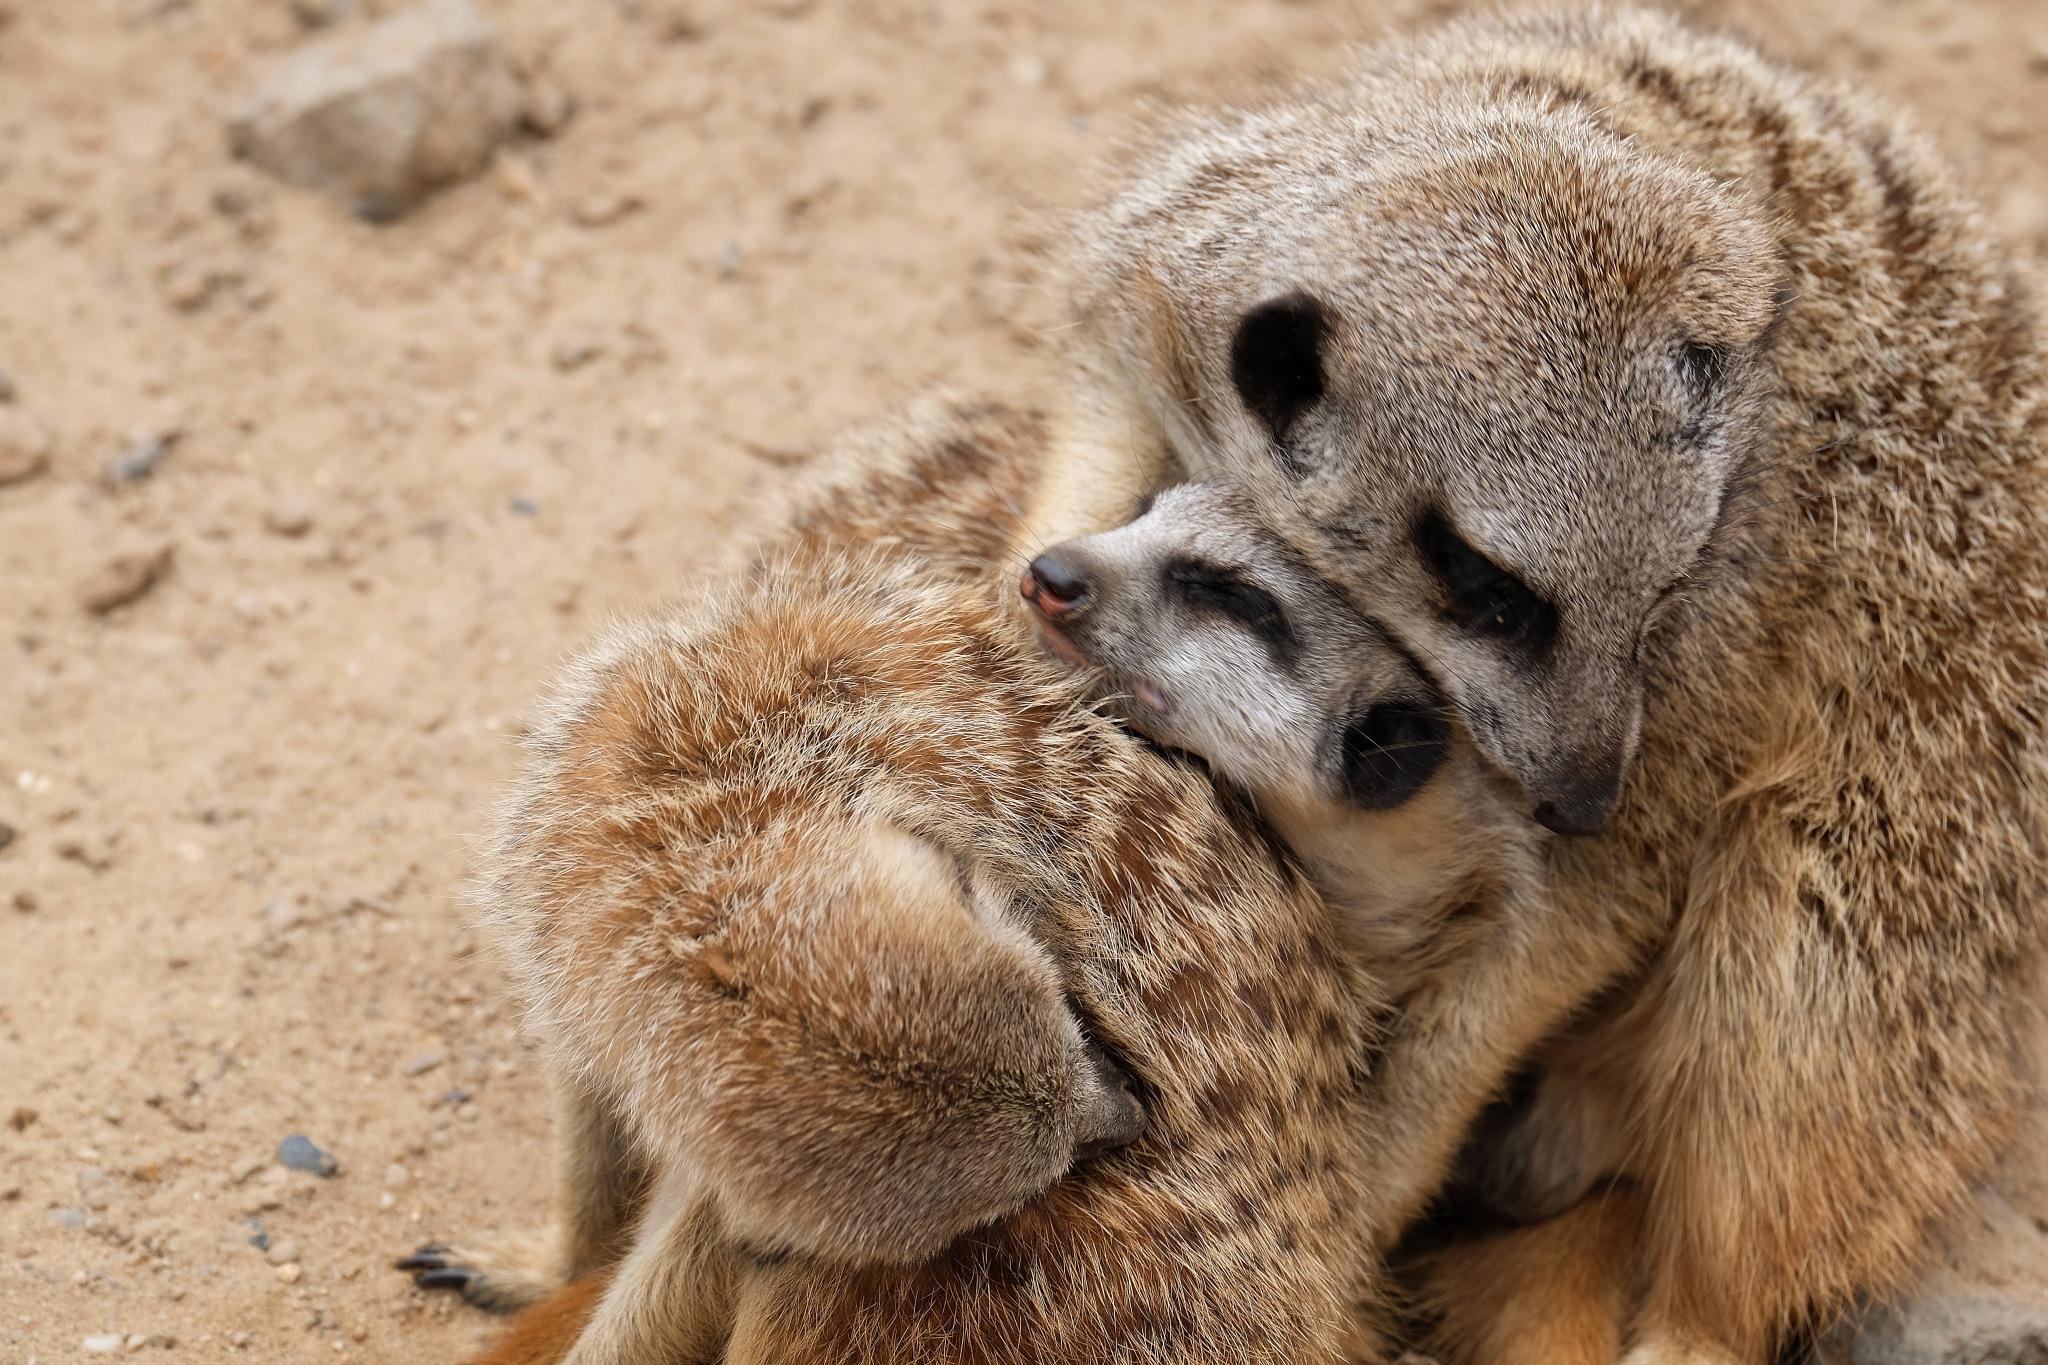 meercat loving her babies  by Christel Mantel